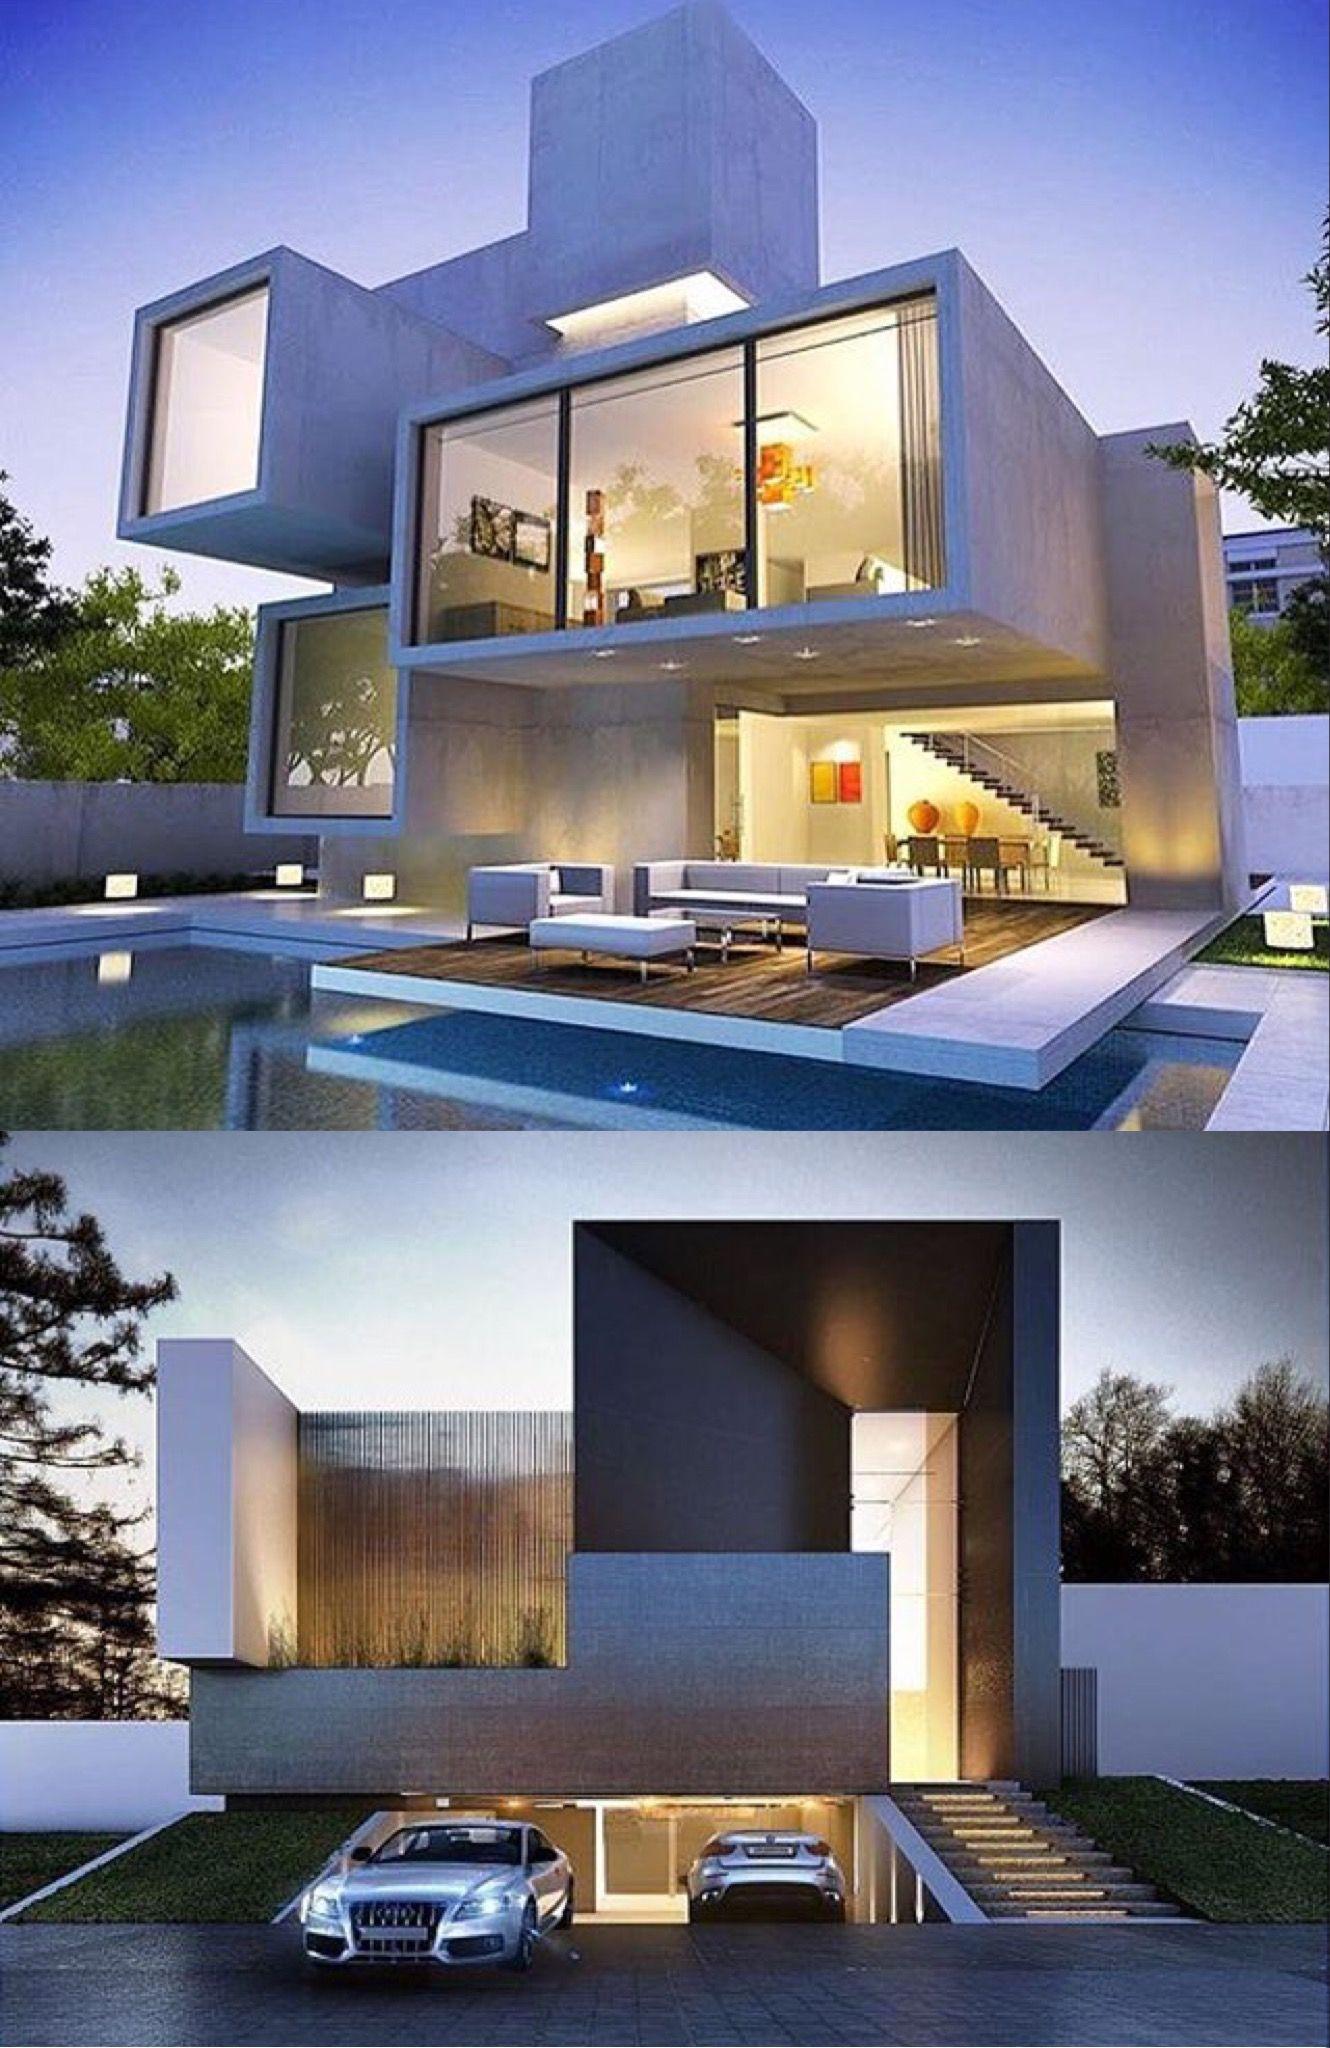 Modern bungalow exterior villa design small home also south african firm nico van der meulen completed  project rh pinterest